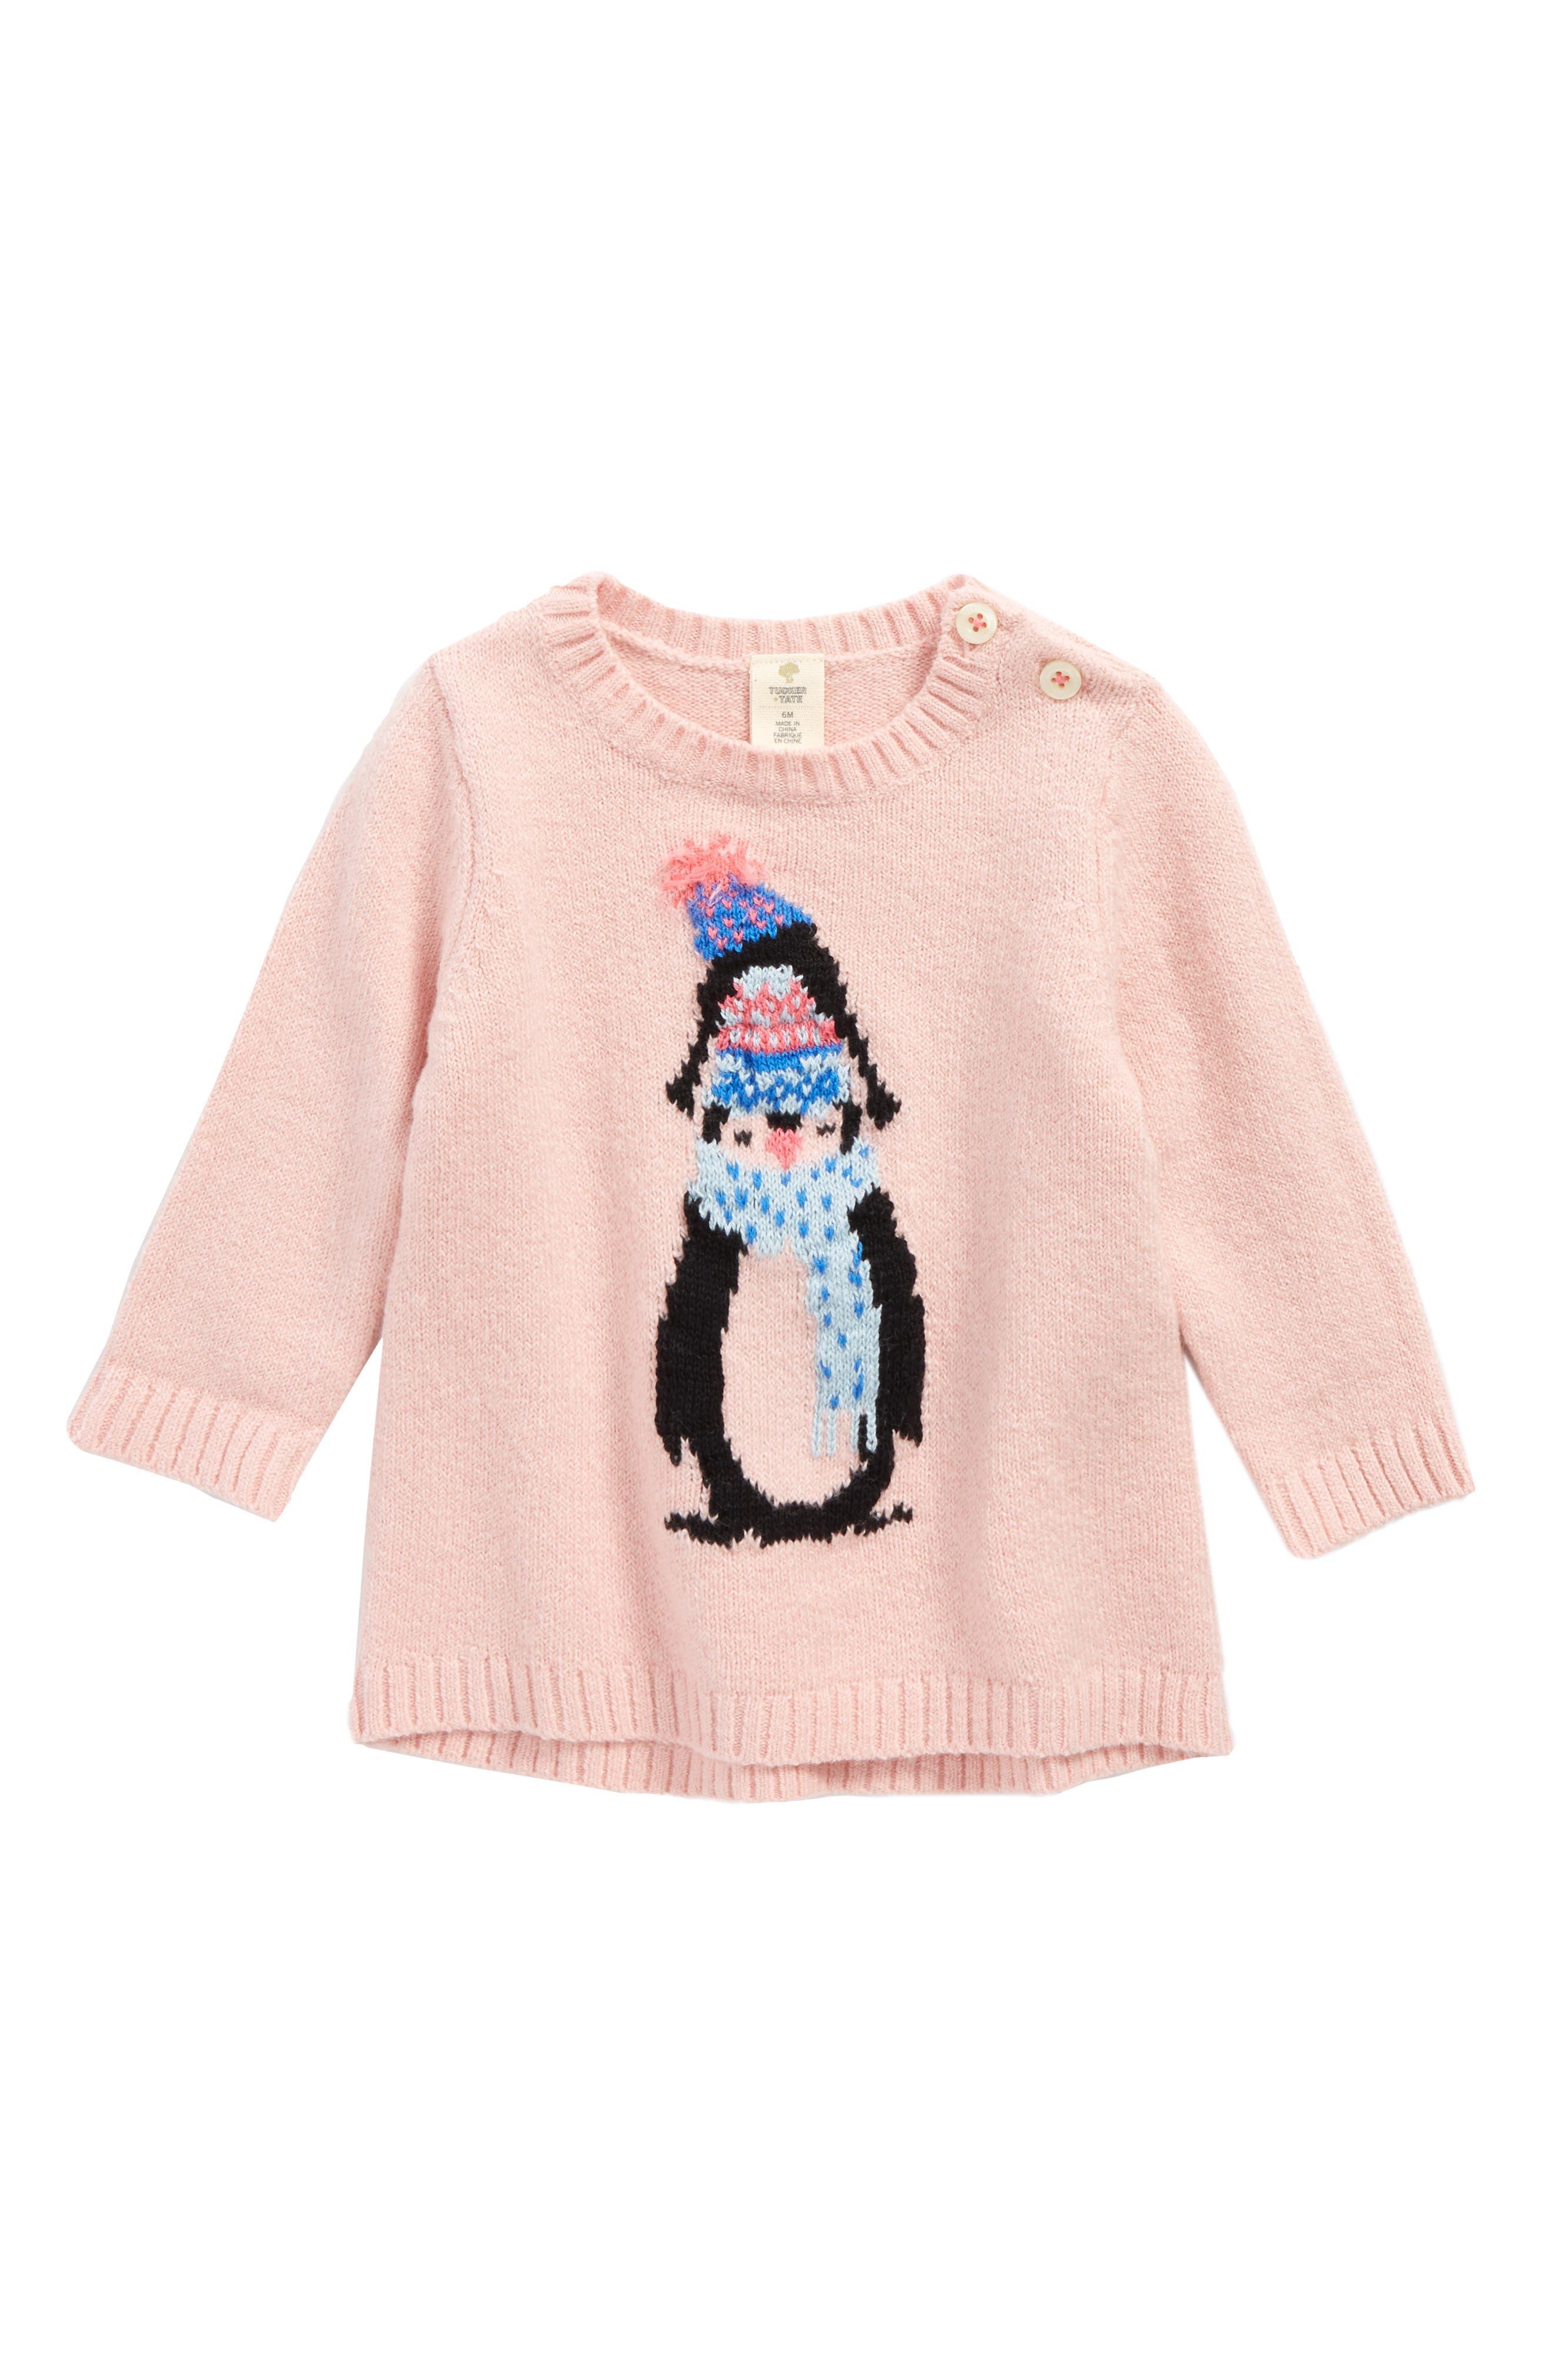 Penguin Sweater,                         Main,                         color, 680